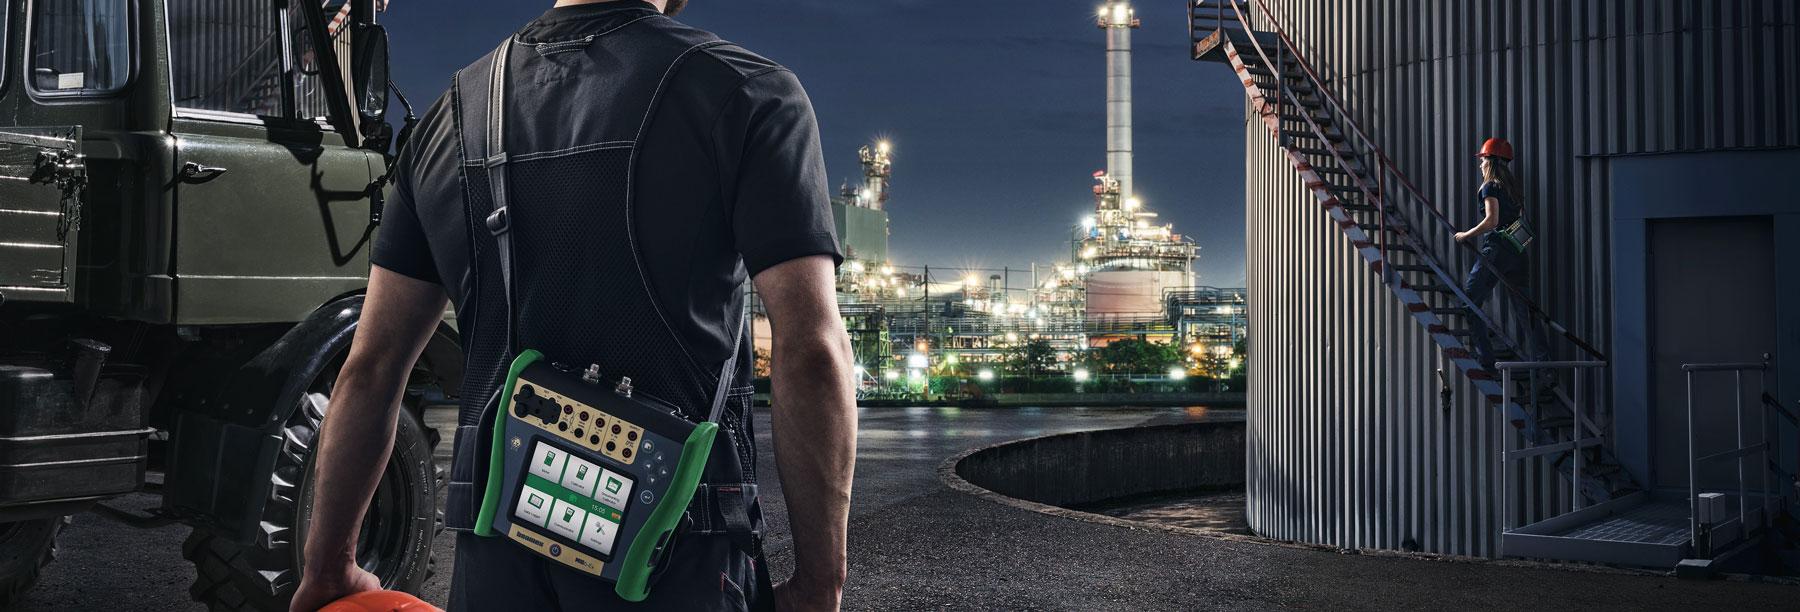 Hazardous-blog-banner.jpg